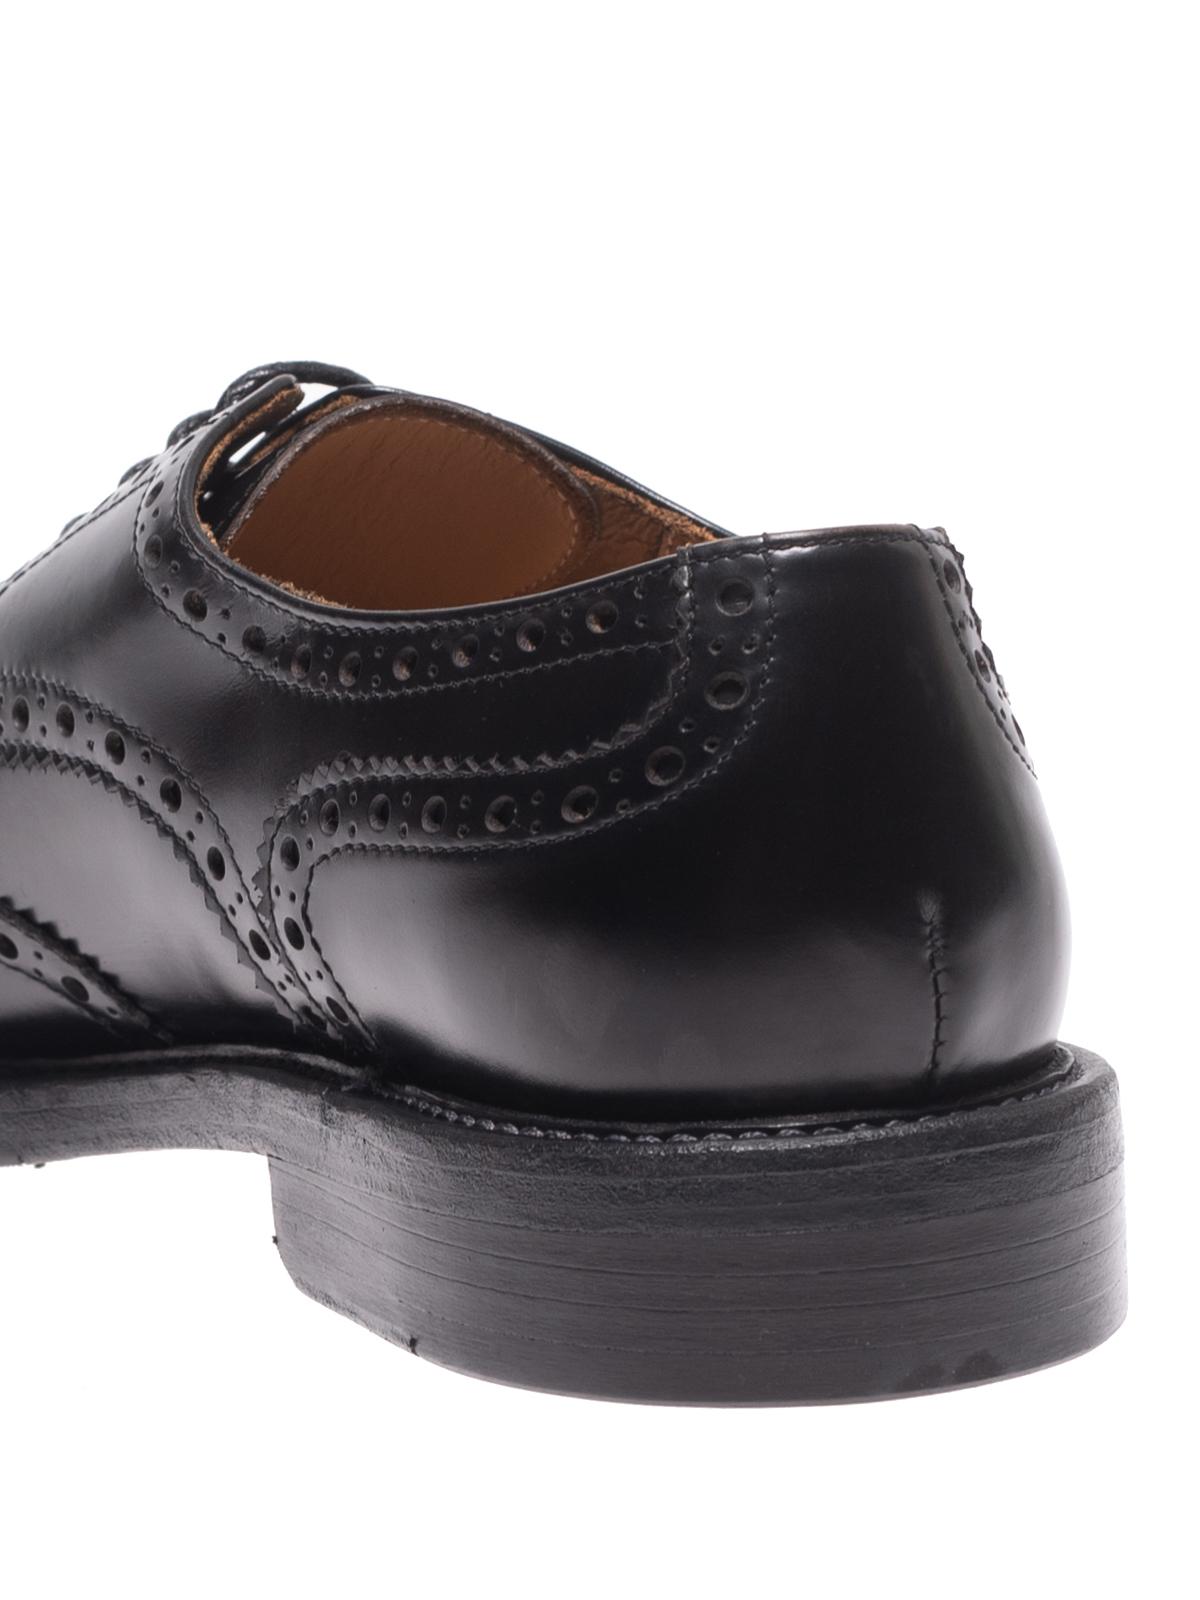 new arrivals 0a71c 62592 Green George - Derby brogue in pelle lucida nera - scarpe ...